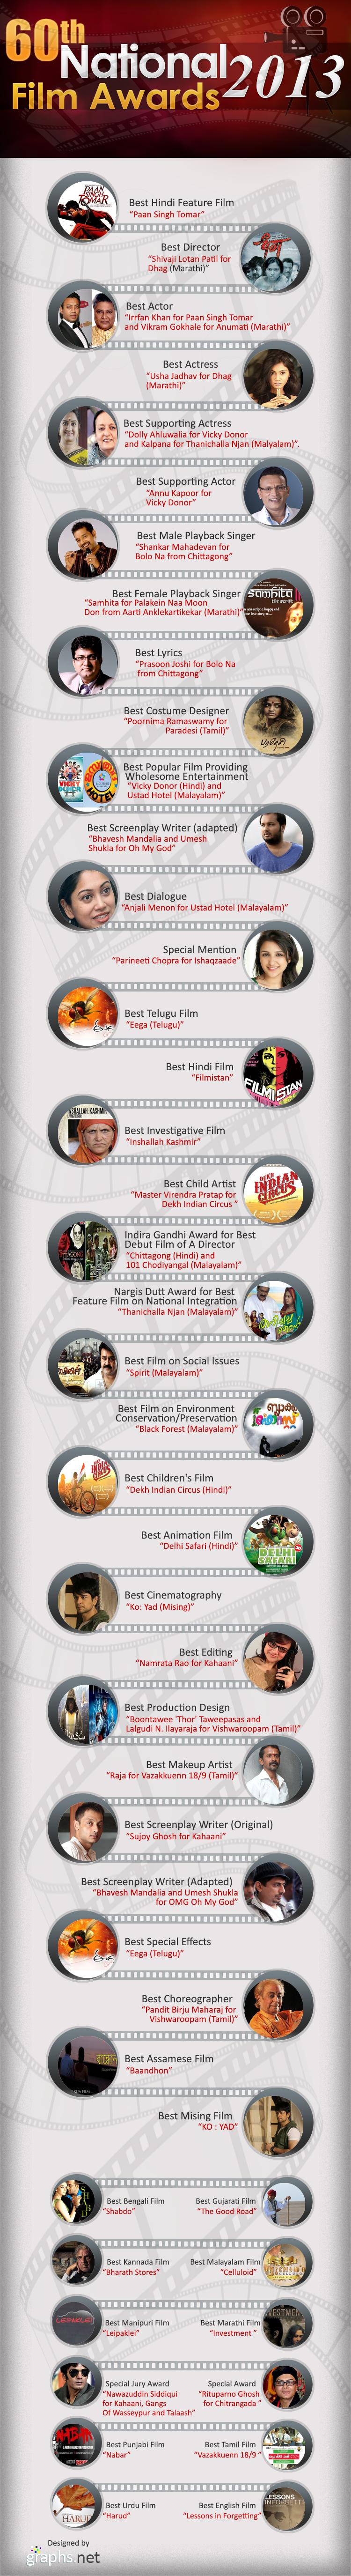 60th National Film Awards Winners